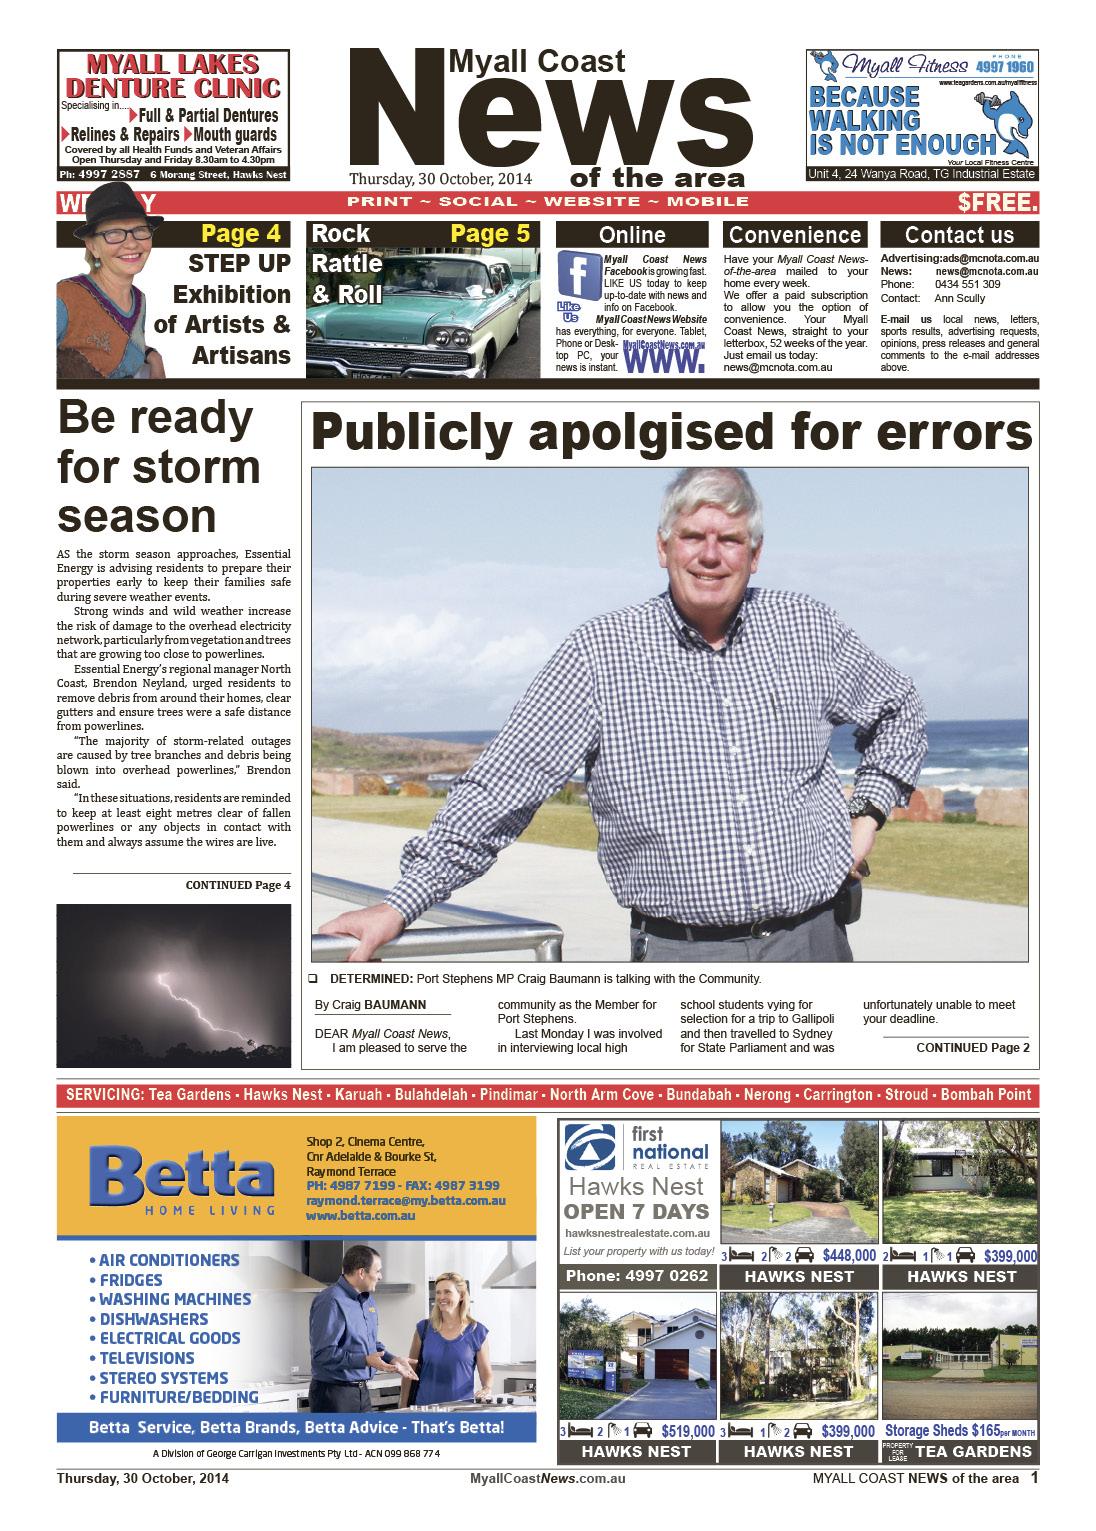 Myall Coast News 30 October 2014